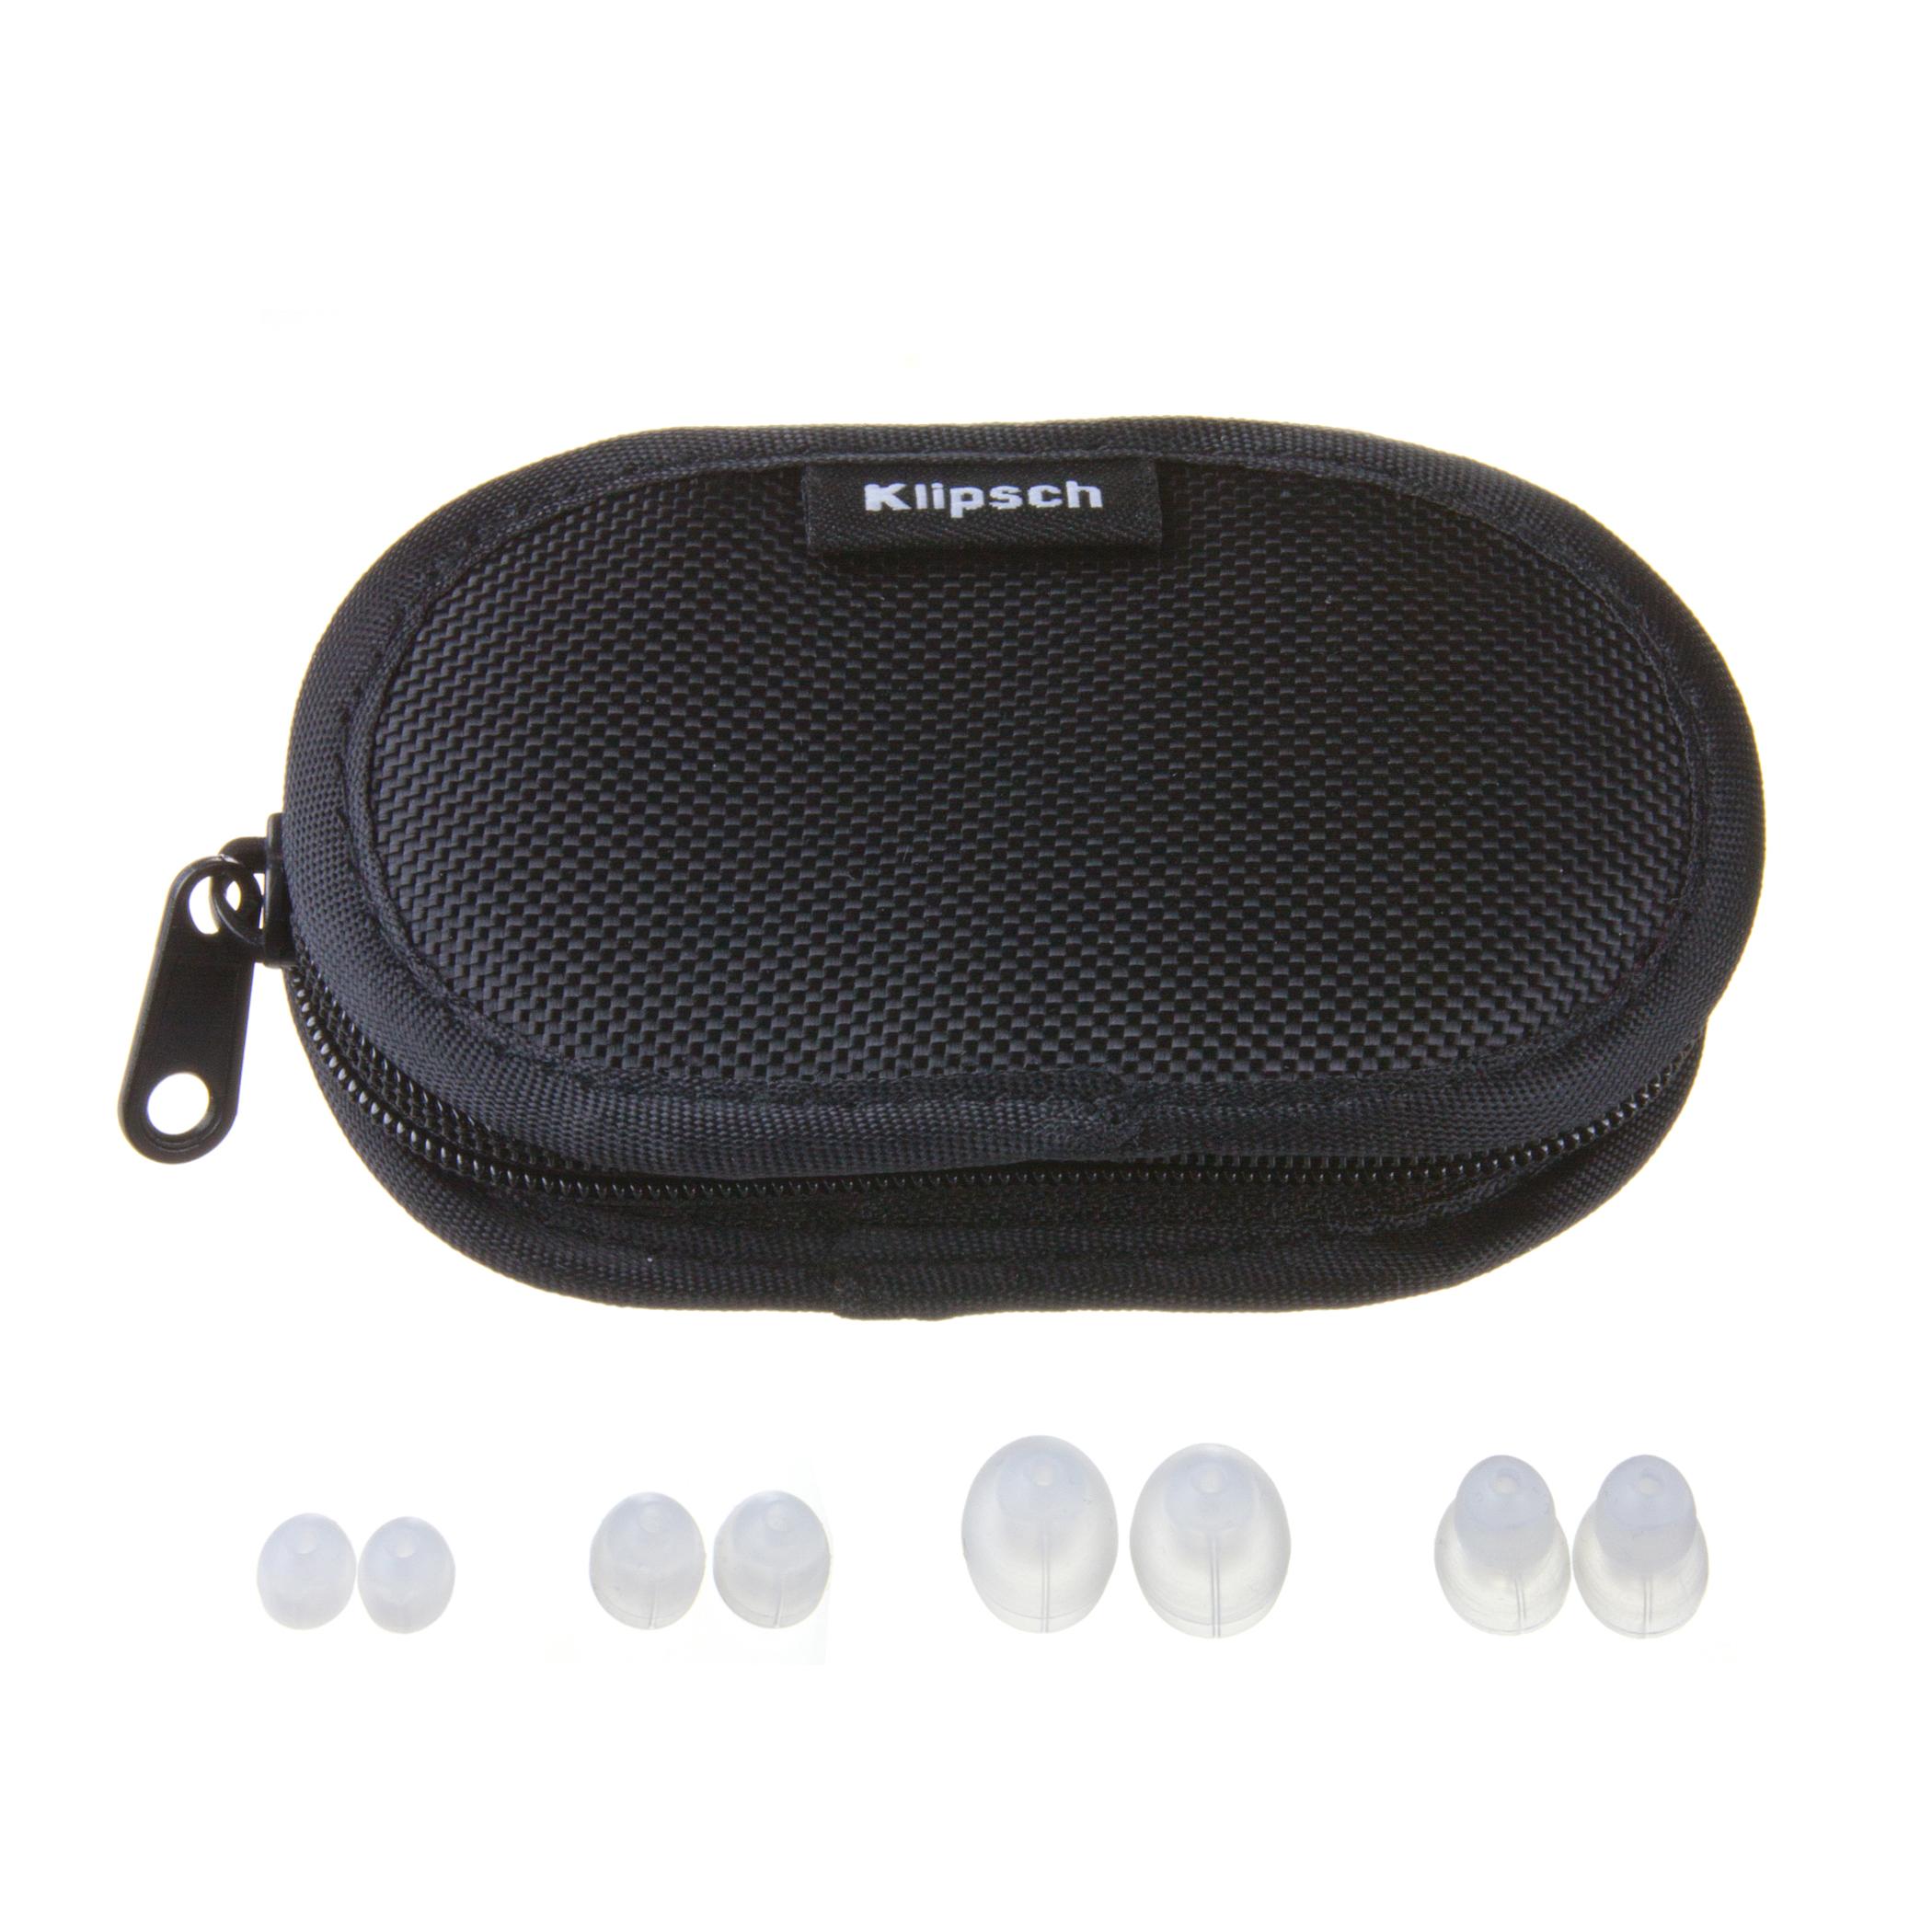 S4 In Ear Headphones Klipsch Headphone Wiring Diagram Added Frills